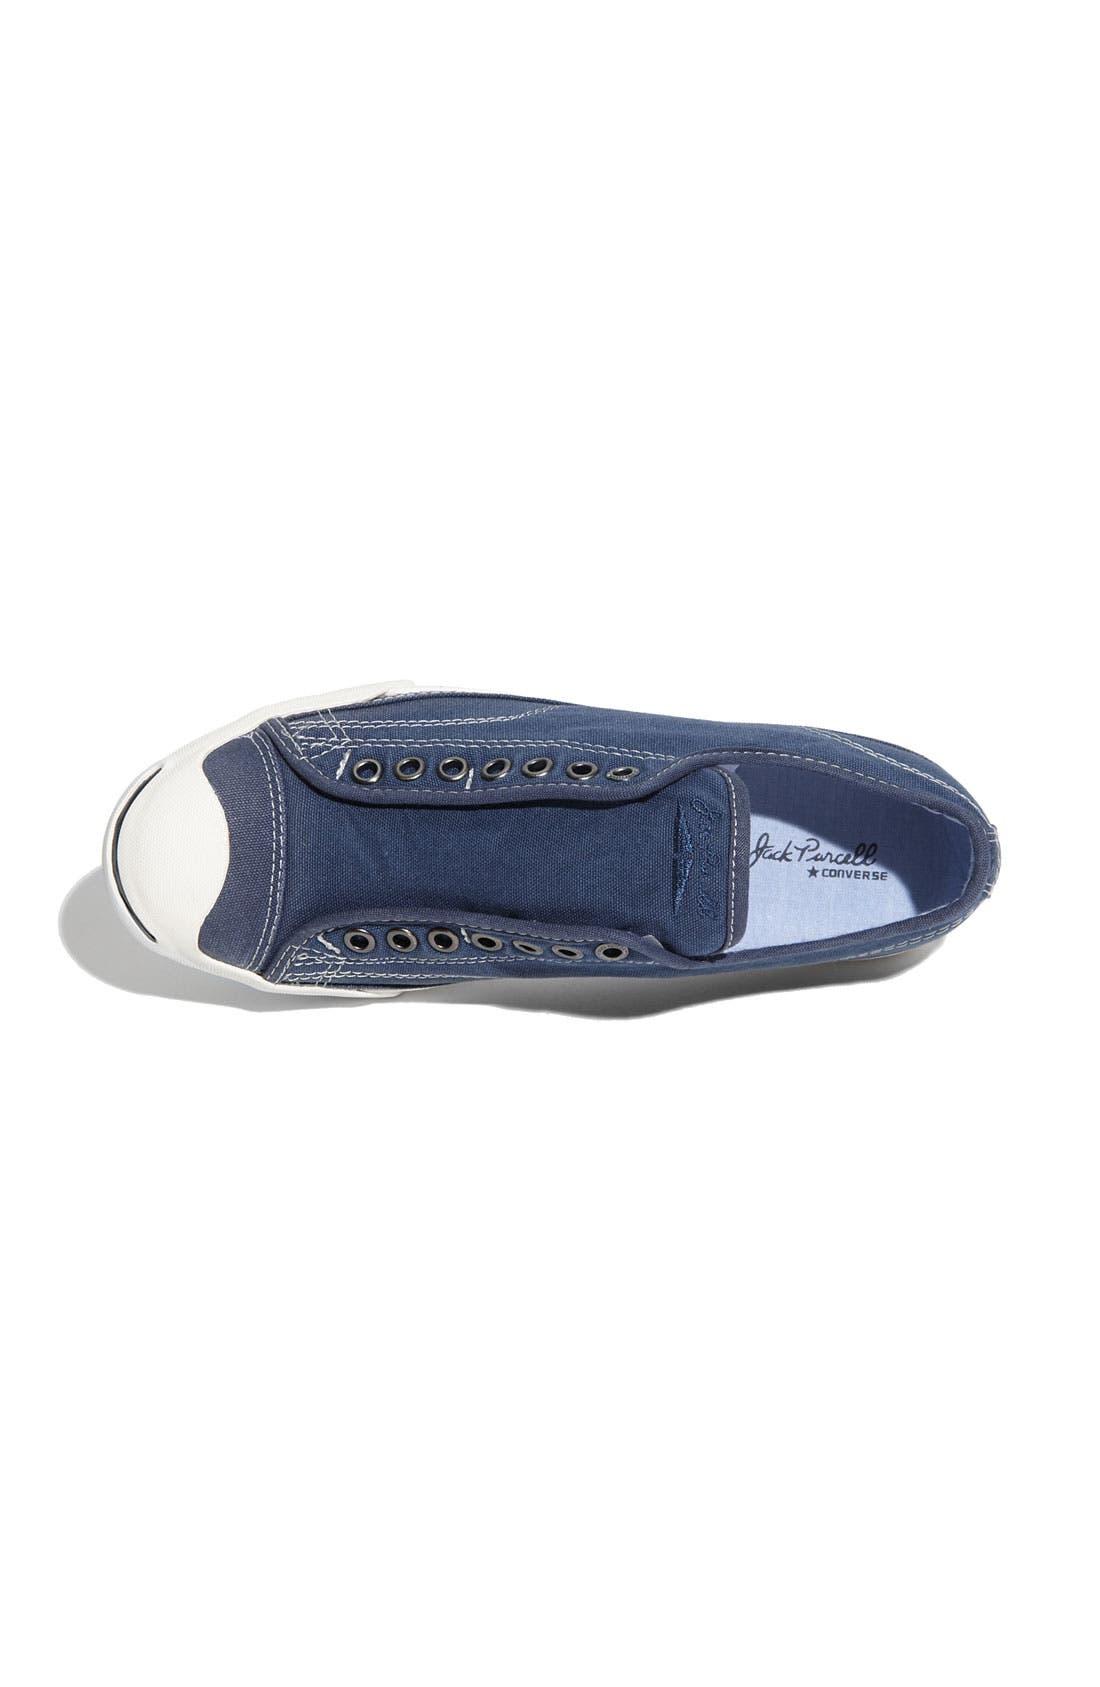 Alternate Image 3  - Converse 'Jack Purcell' Slip-On Sneaker (Women)